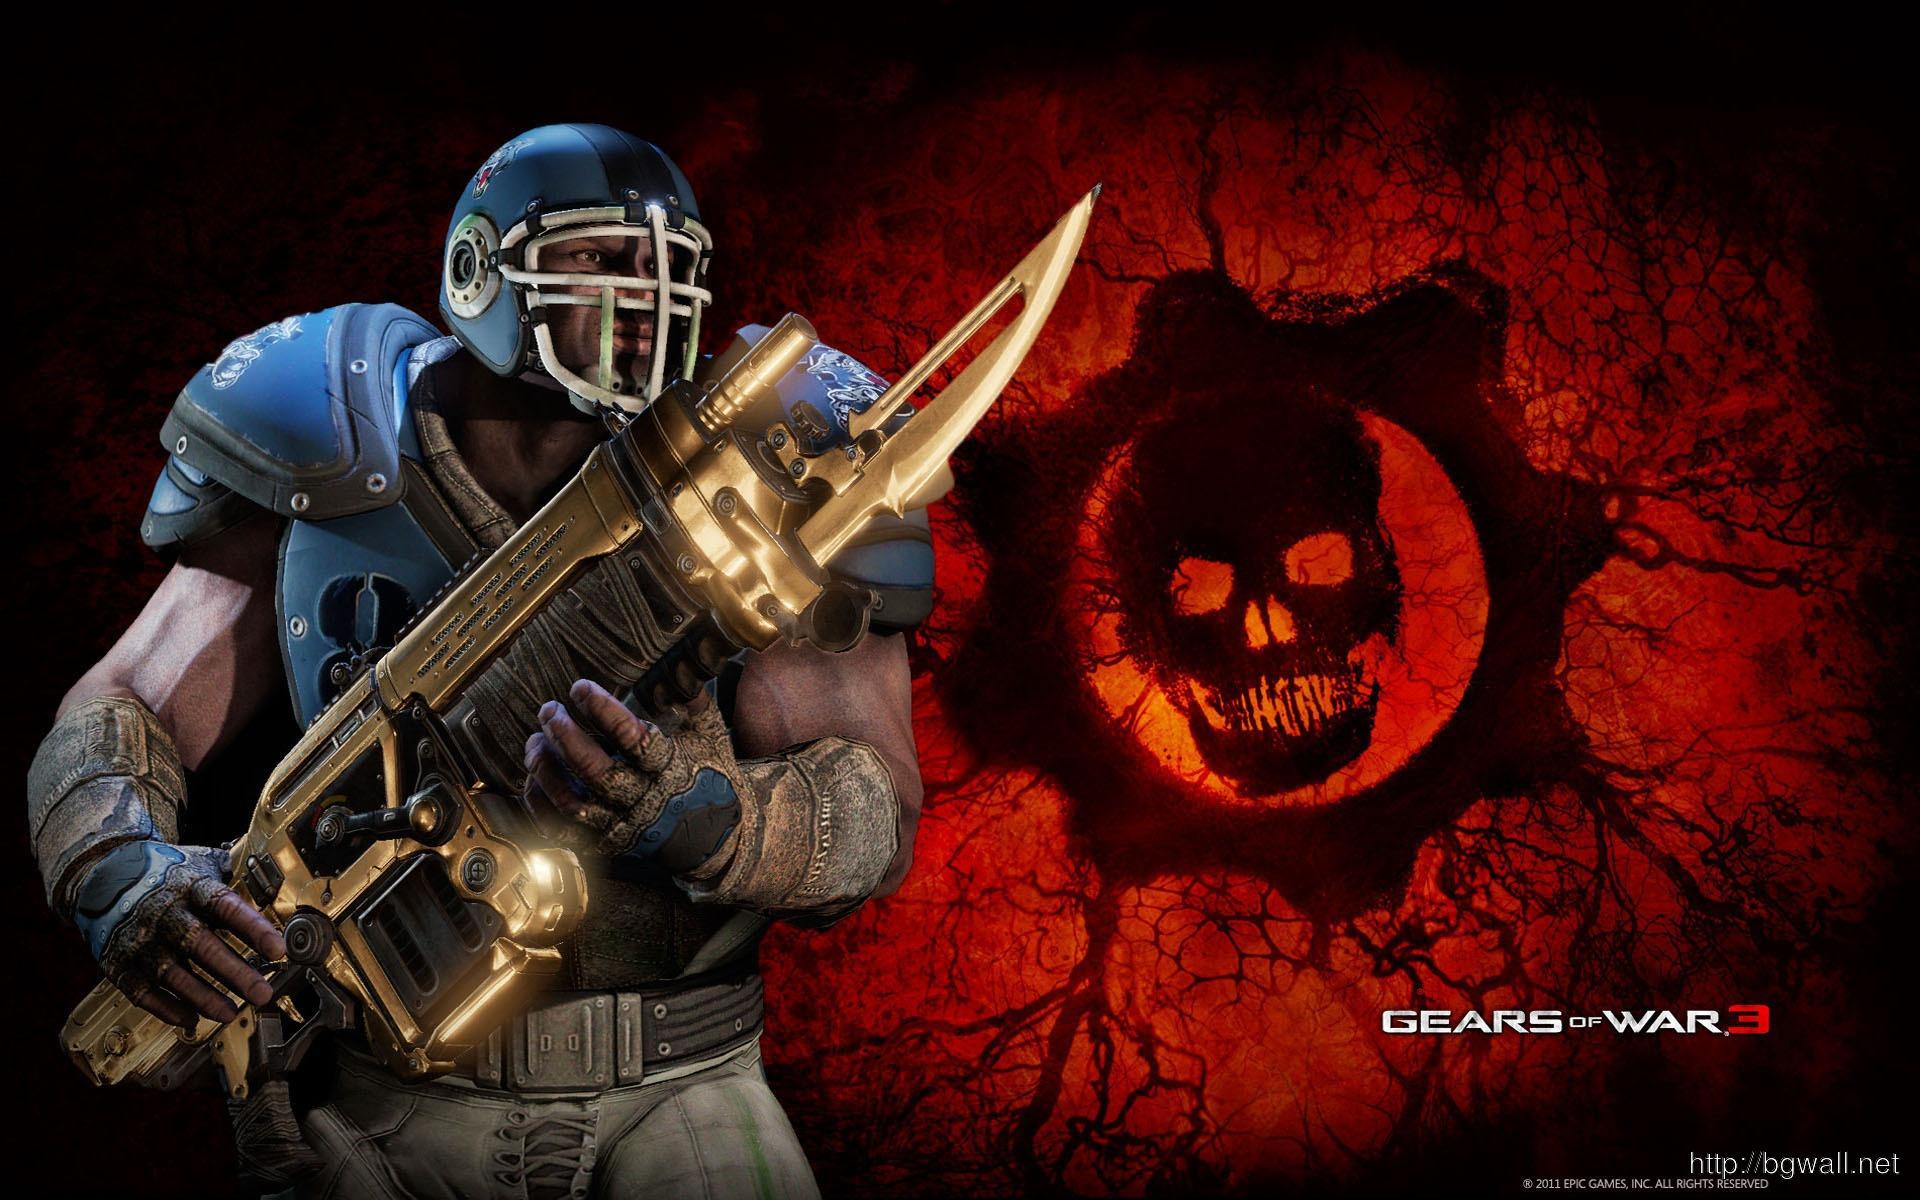 Gears Of War 3 Wallpaper For Pc Full Size